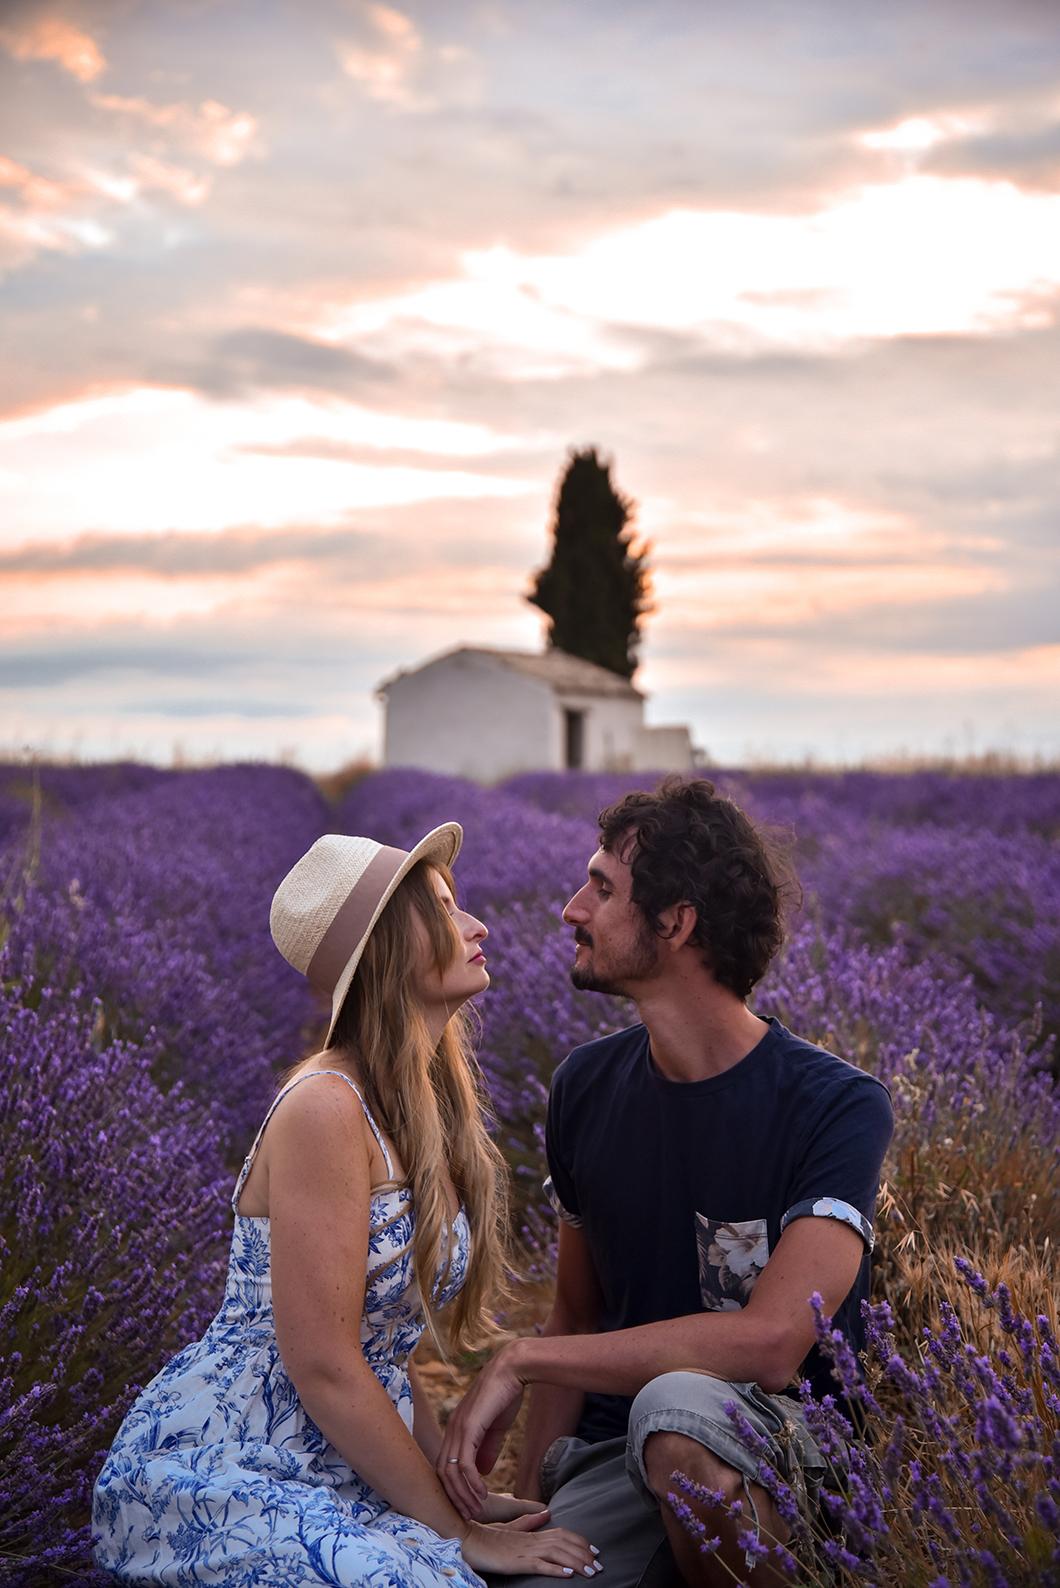 Valensole, incontournable en Provence